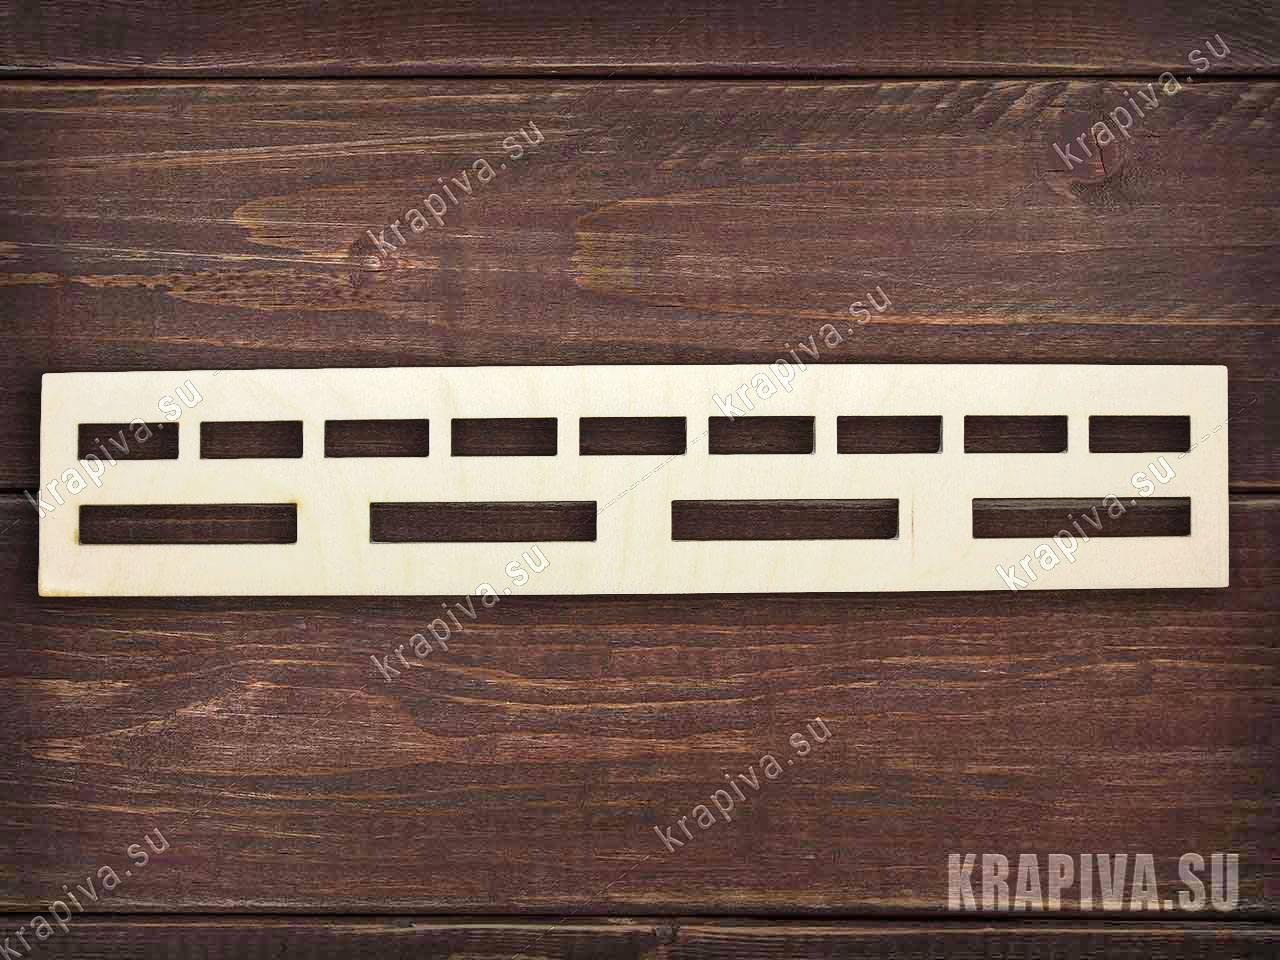 Развивающая линейка за 46 руб. в магазине Крапива (krapiva.su) (фото)